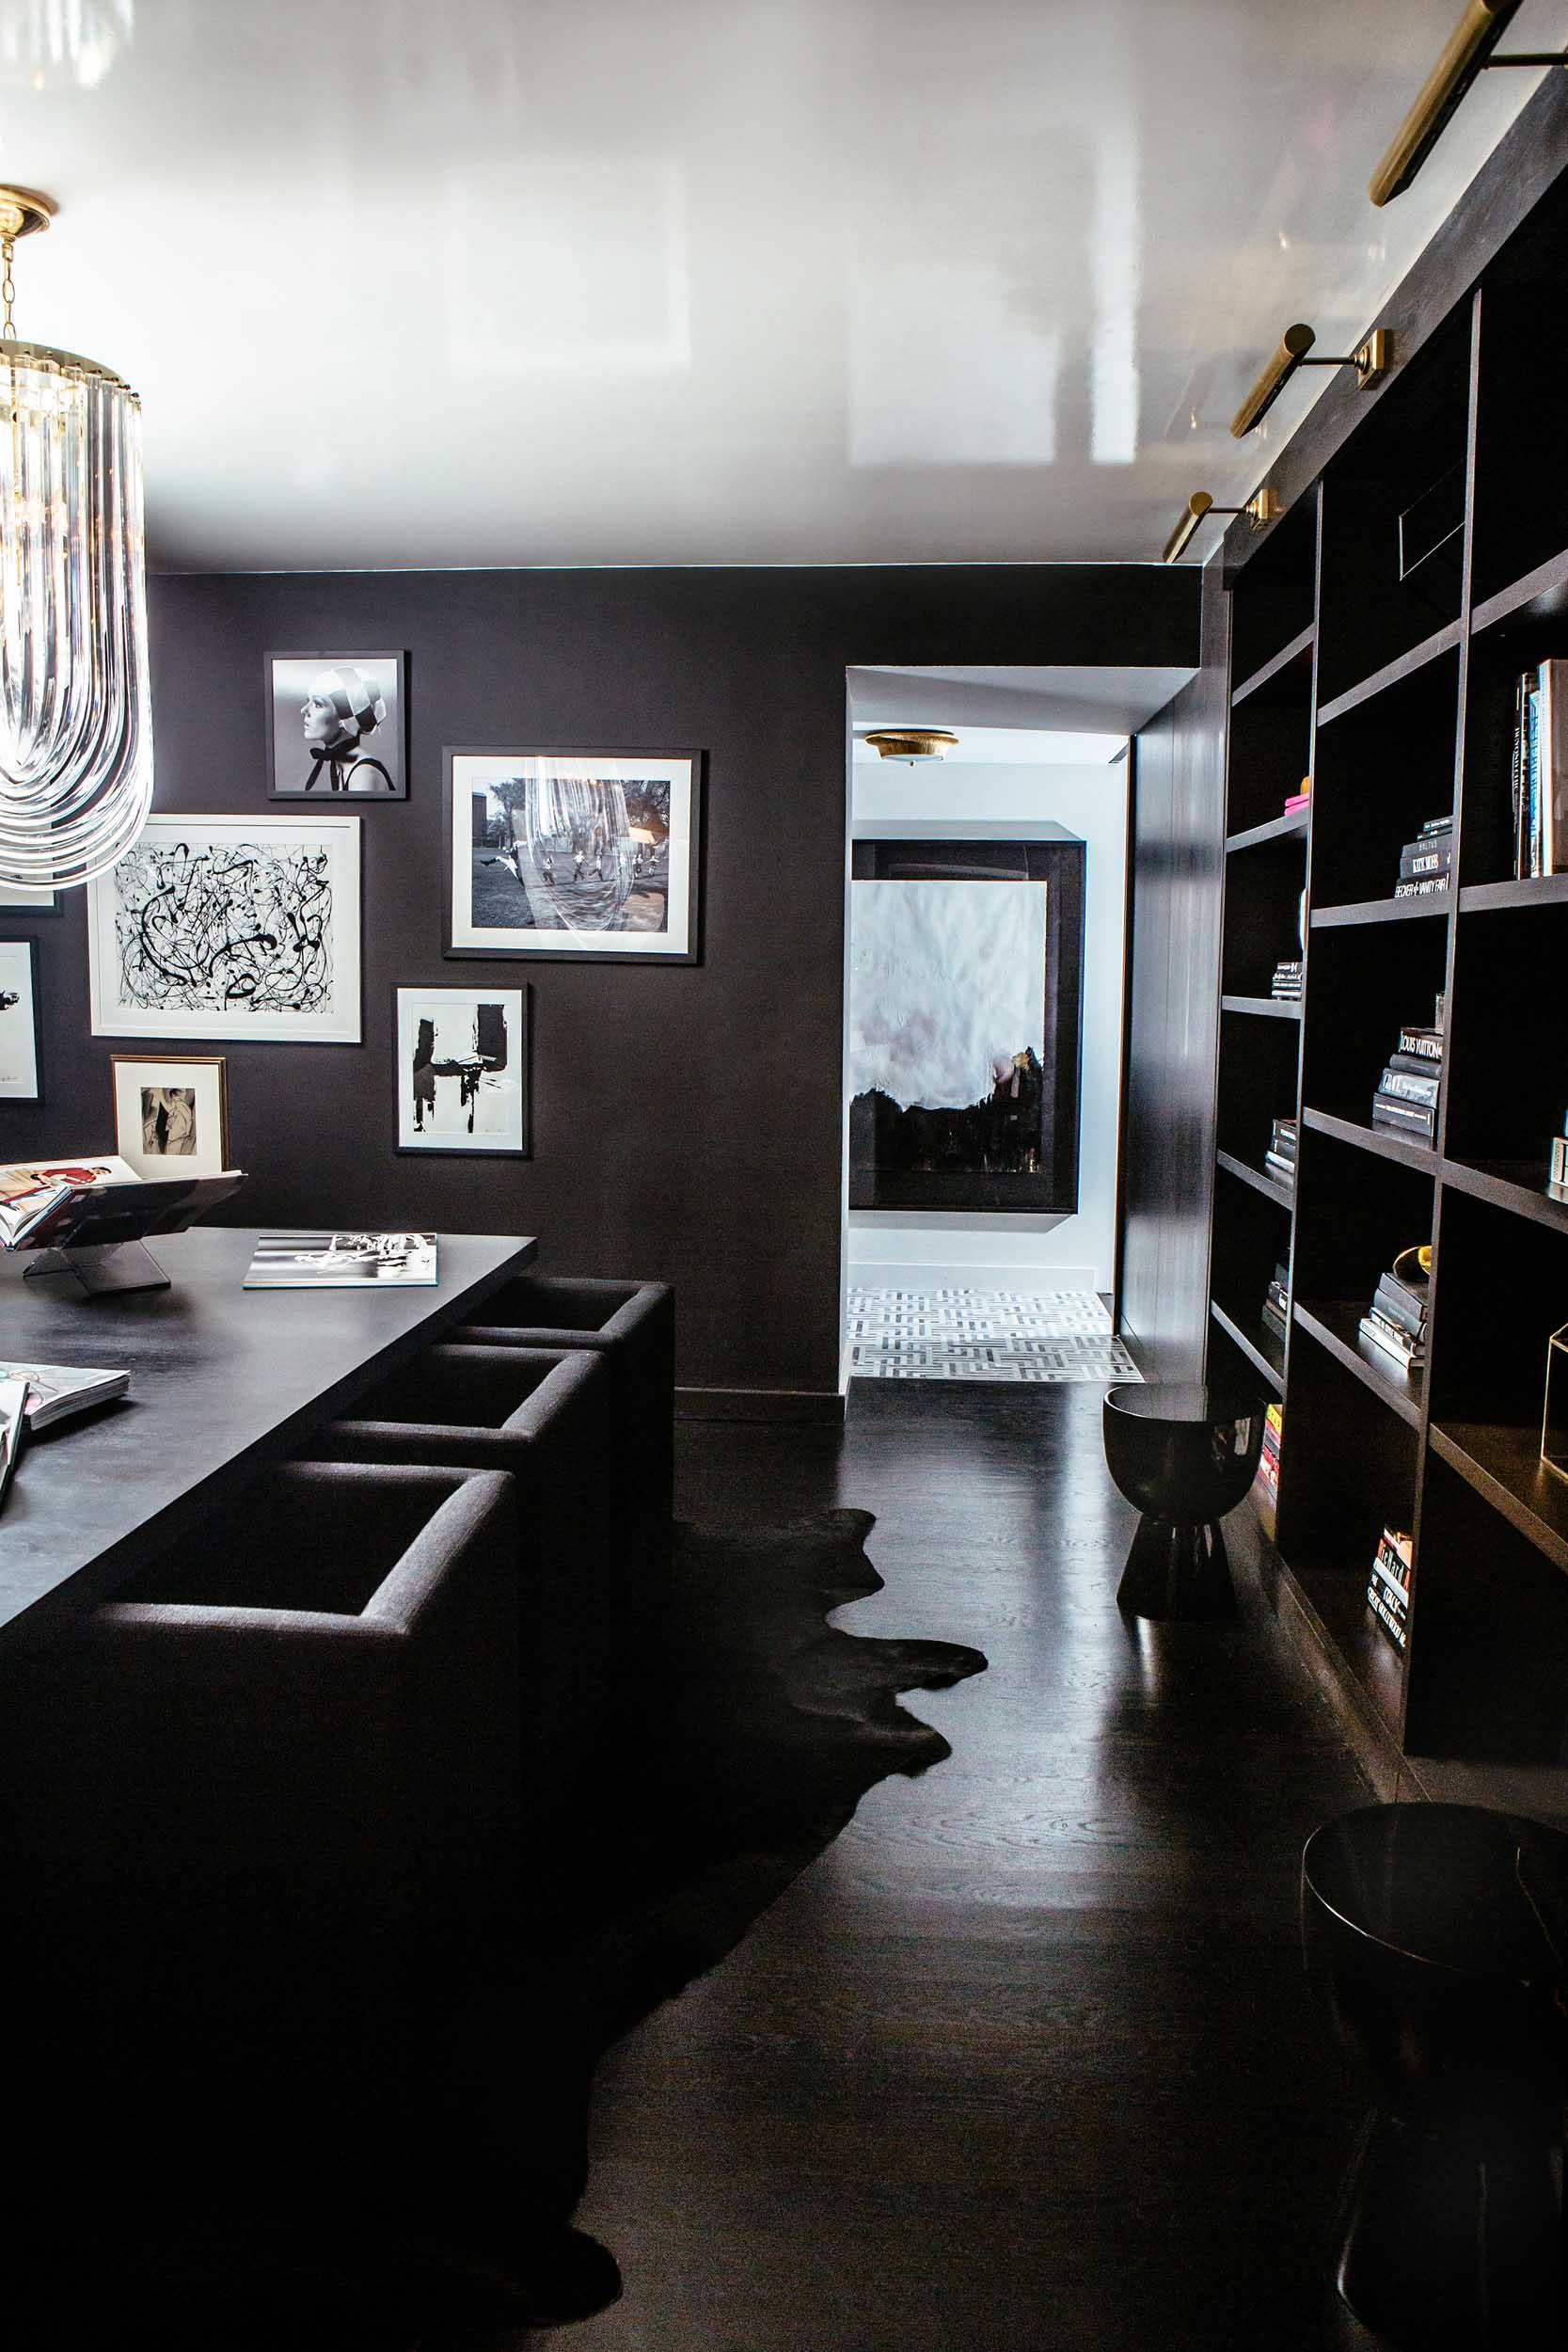 Leo_Designs_Chicago_interior_lake_shore_renovation19.jpg